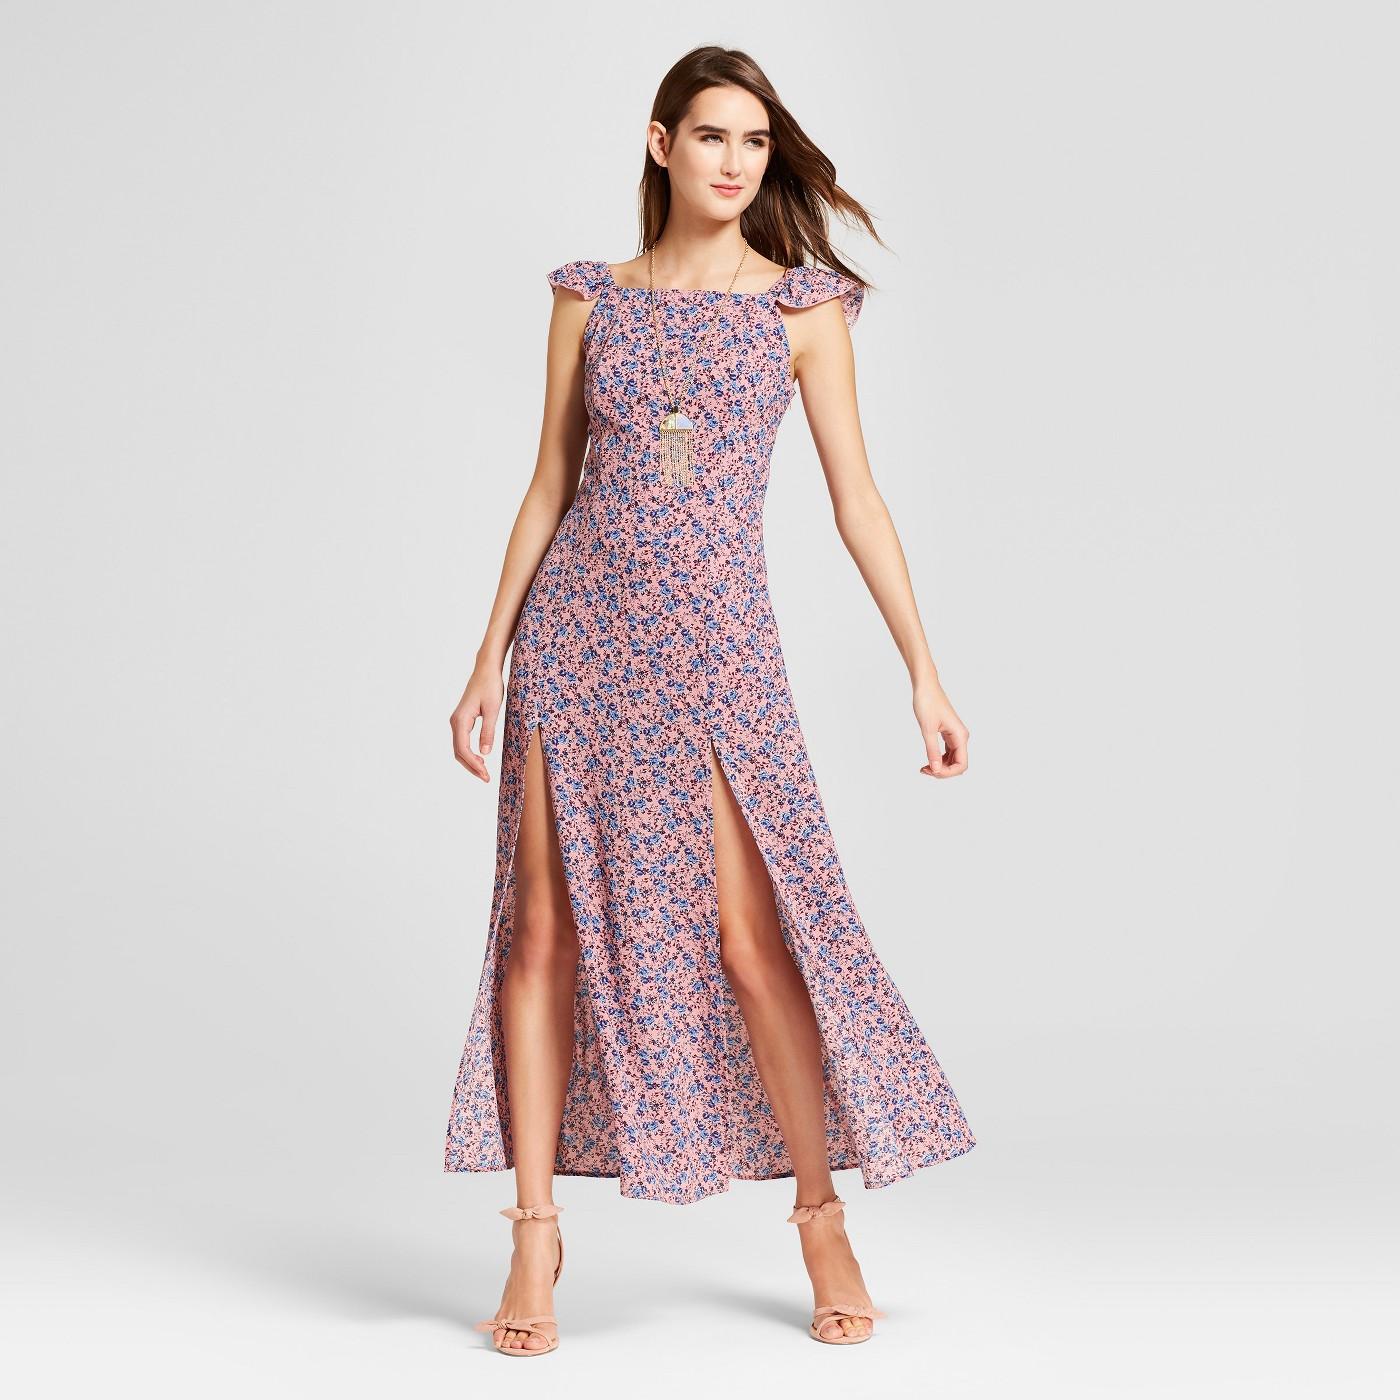 maxi dresses best under 35 summer target ruffle sleeves cut out